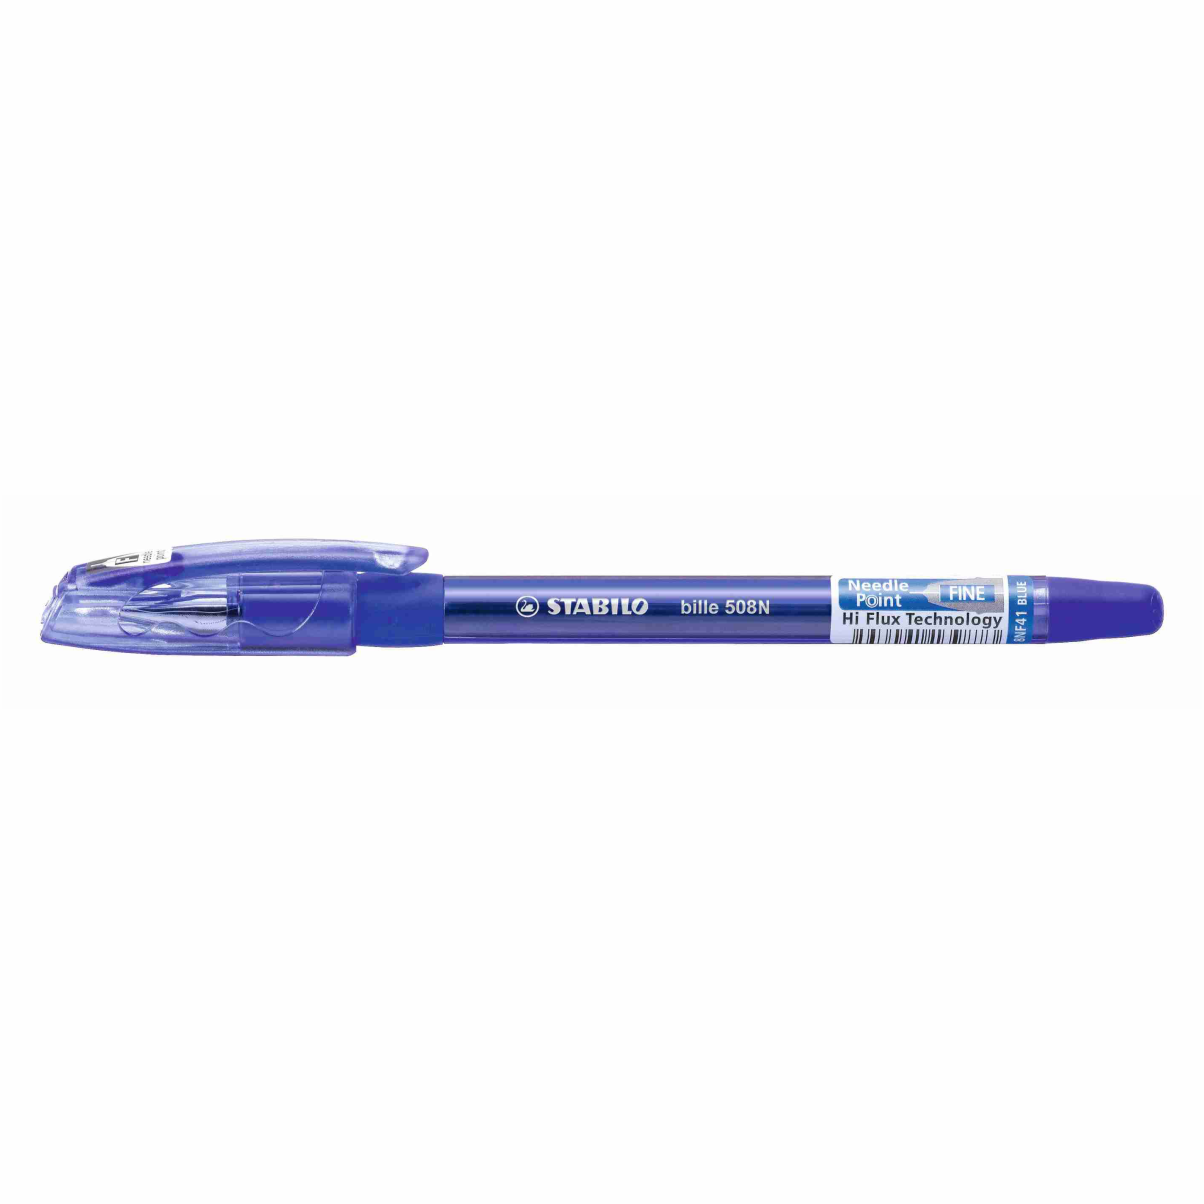 Caneta esferográfica 0.4 azul BILLE 508N Stabilo